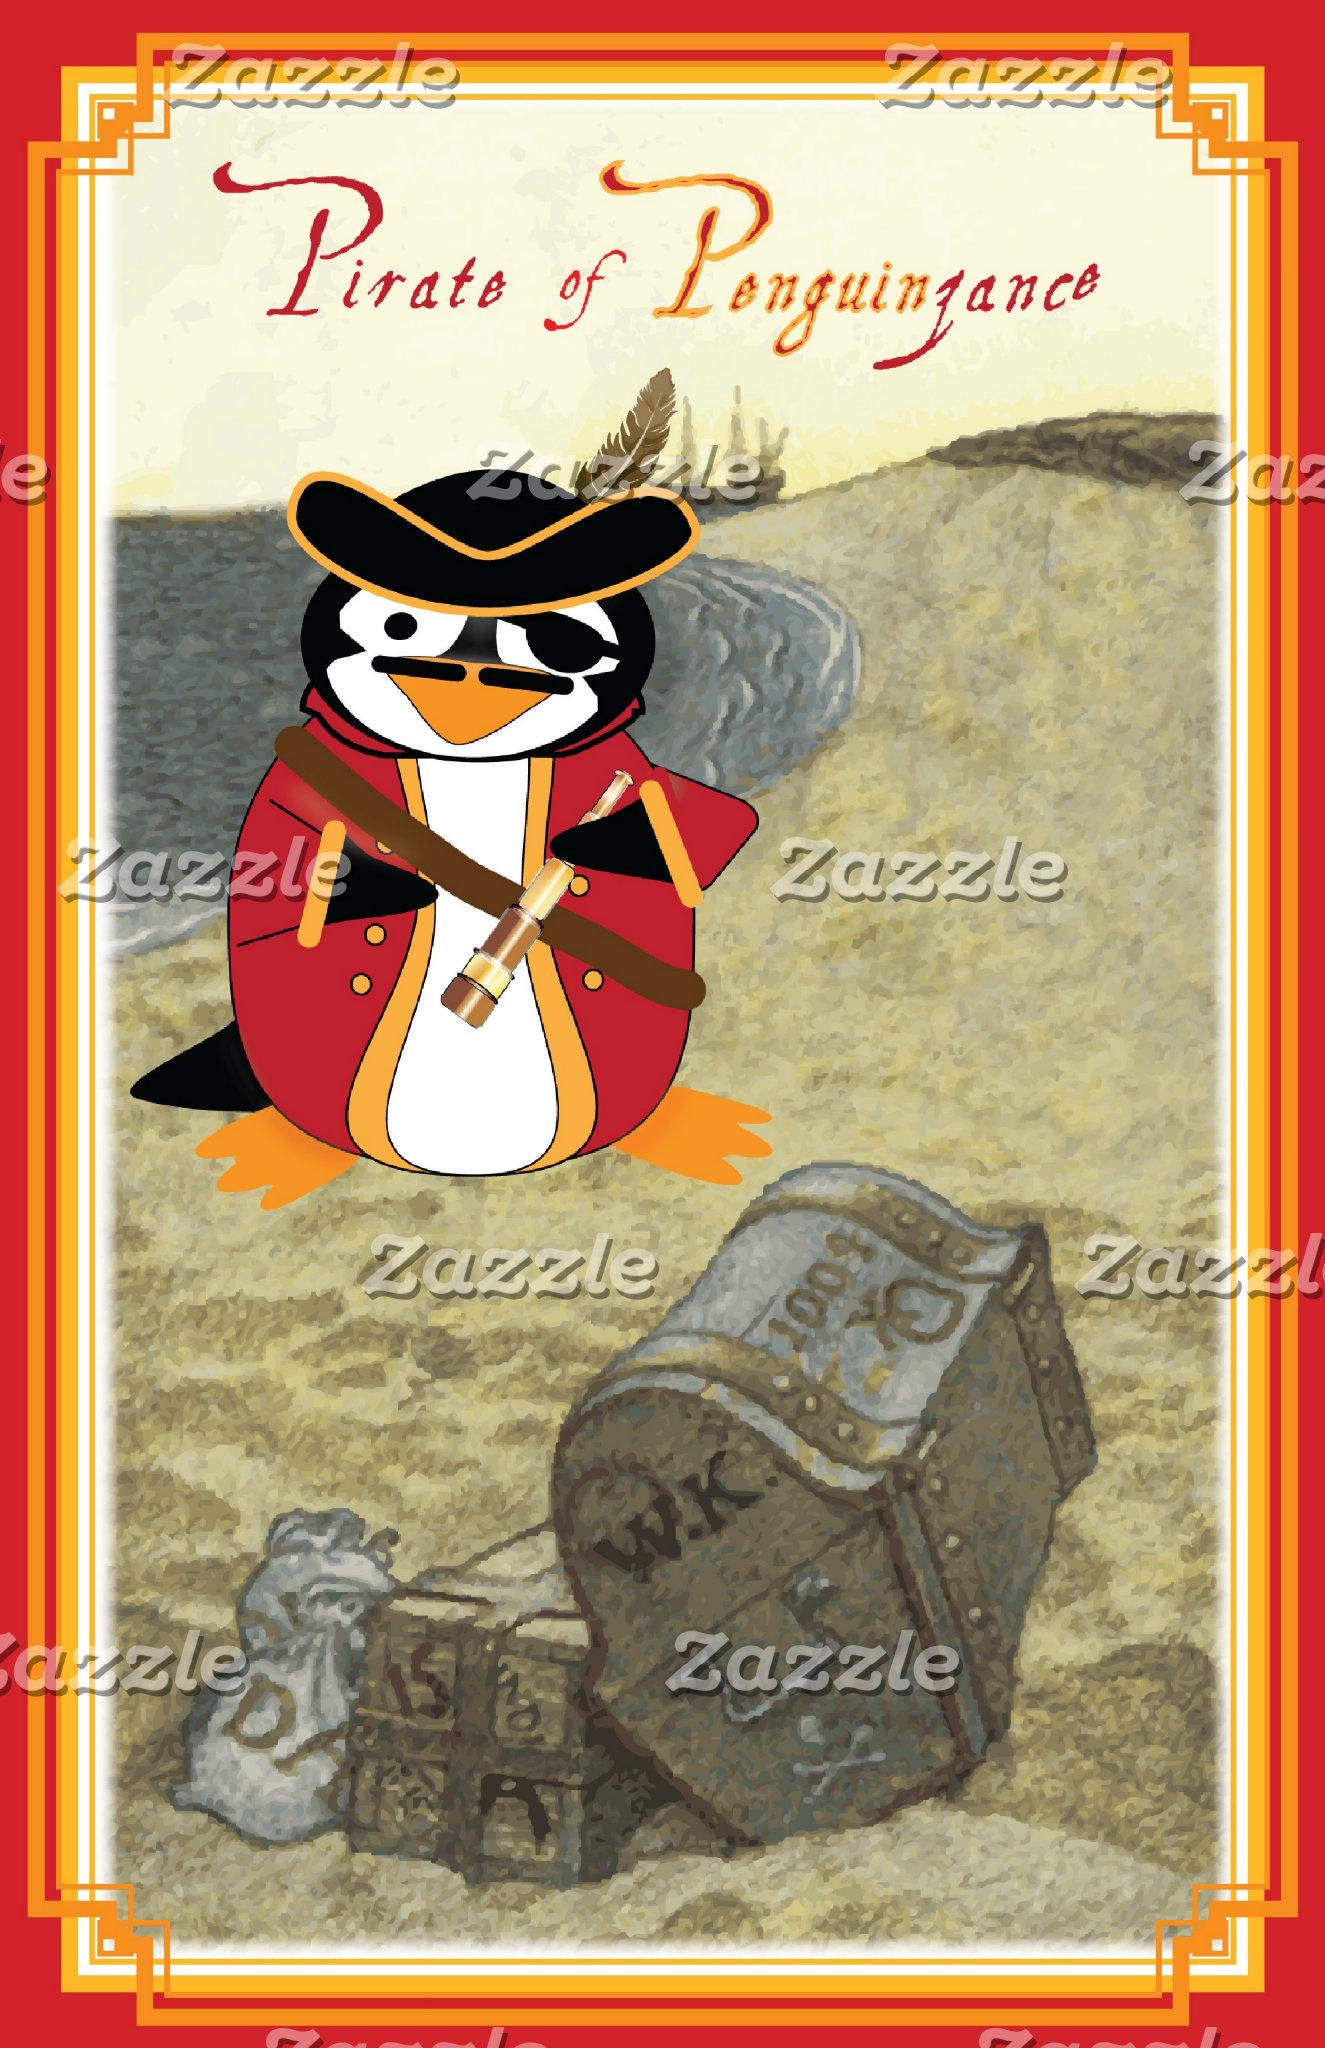 Piratez of Penguinance